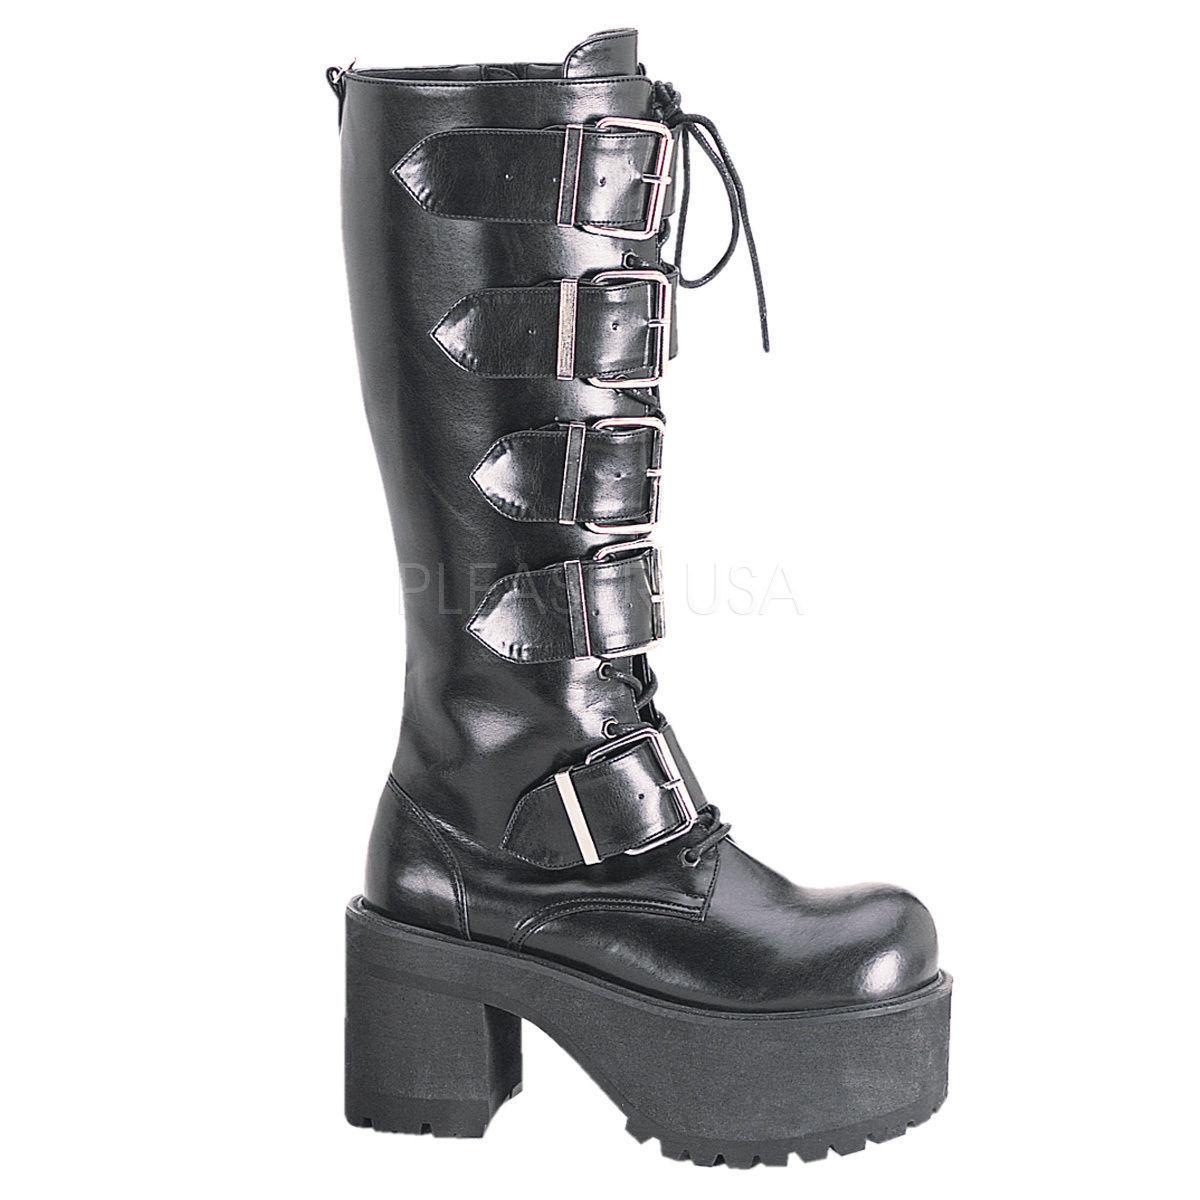 Demonia RANGER 318 Donna Goth Punk Cosplay Stivali fibbie tacco piattaforma al ginocchio fibbie Stivali 39d558